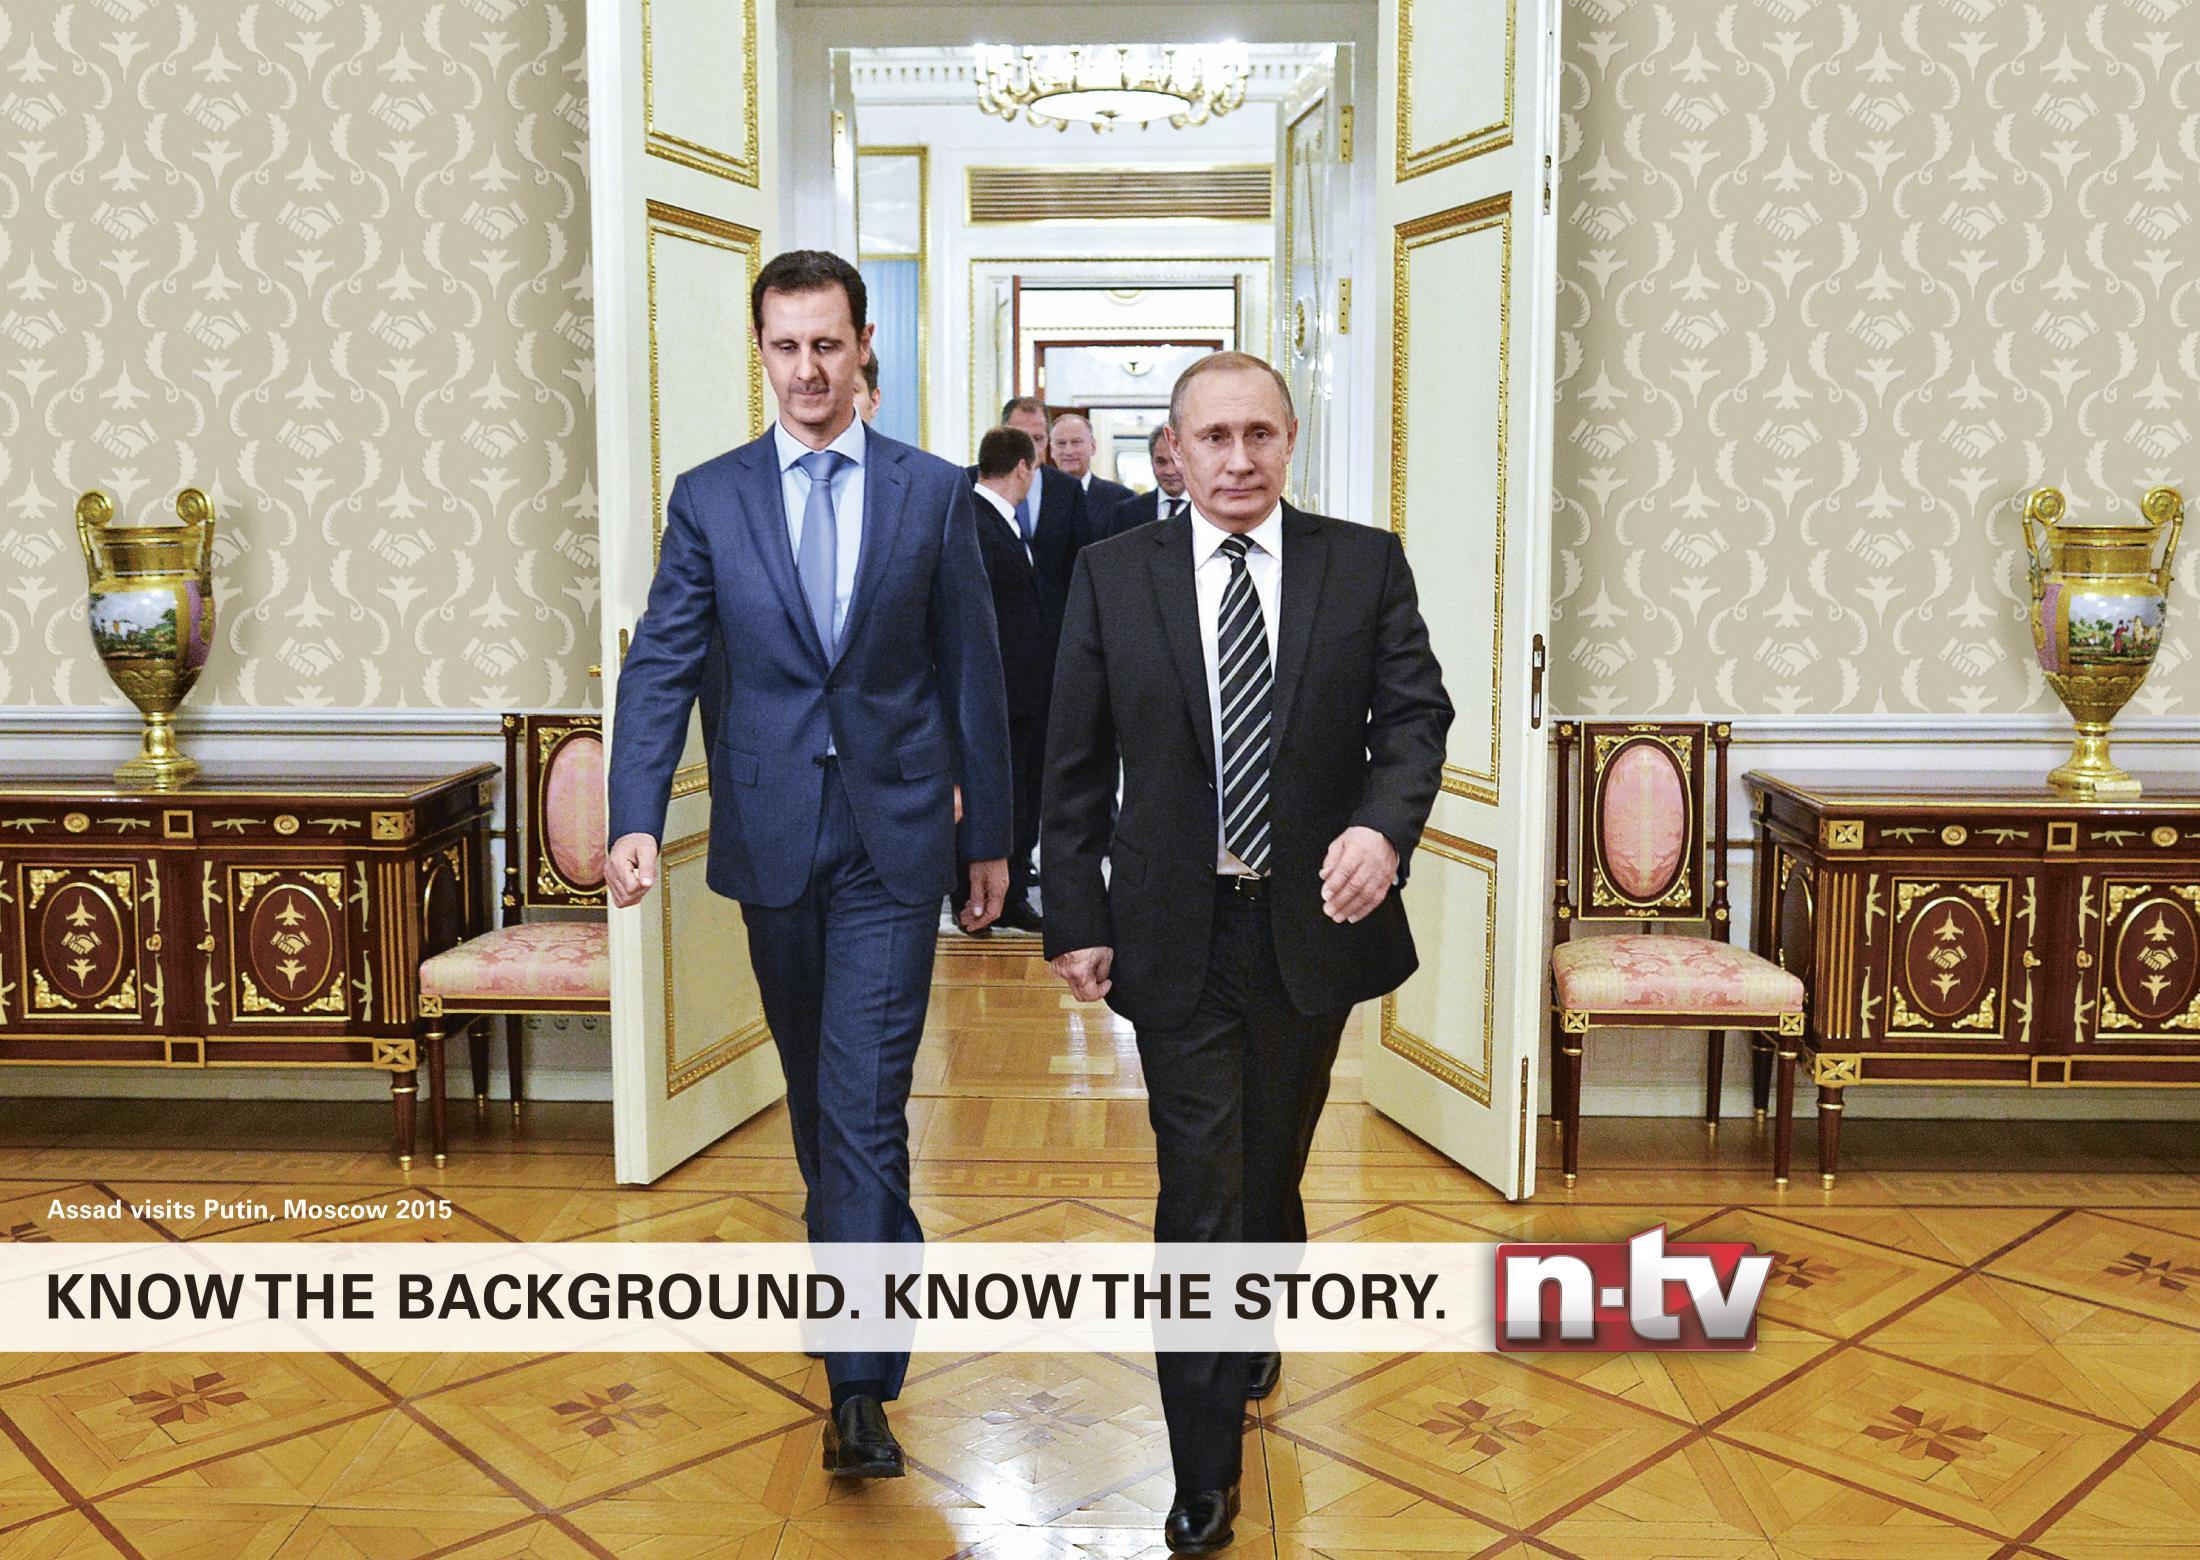 Thumbnail for wallpaper-stories: syria